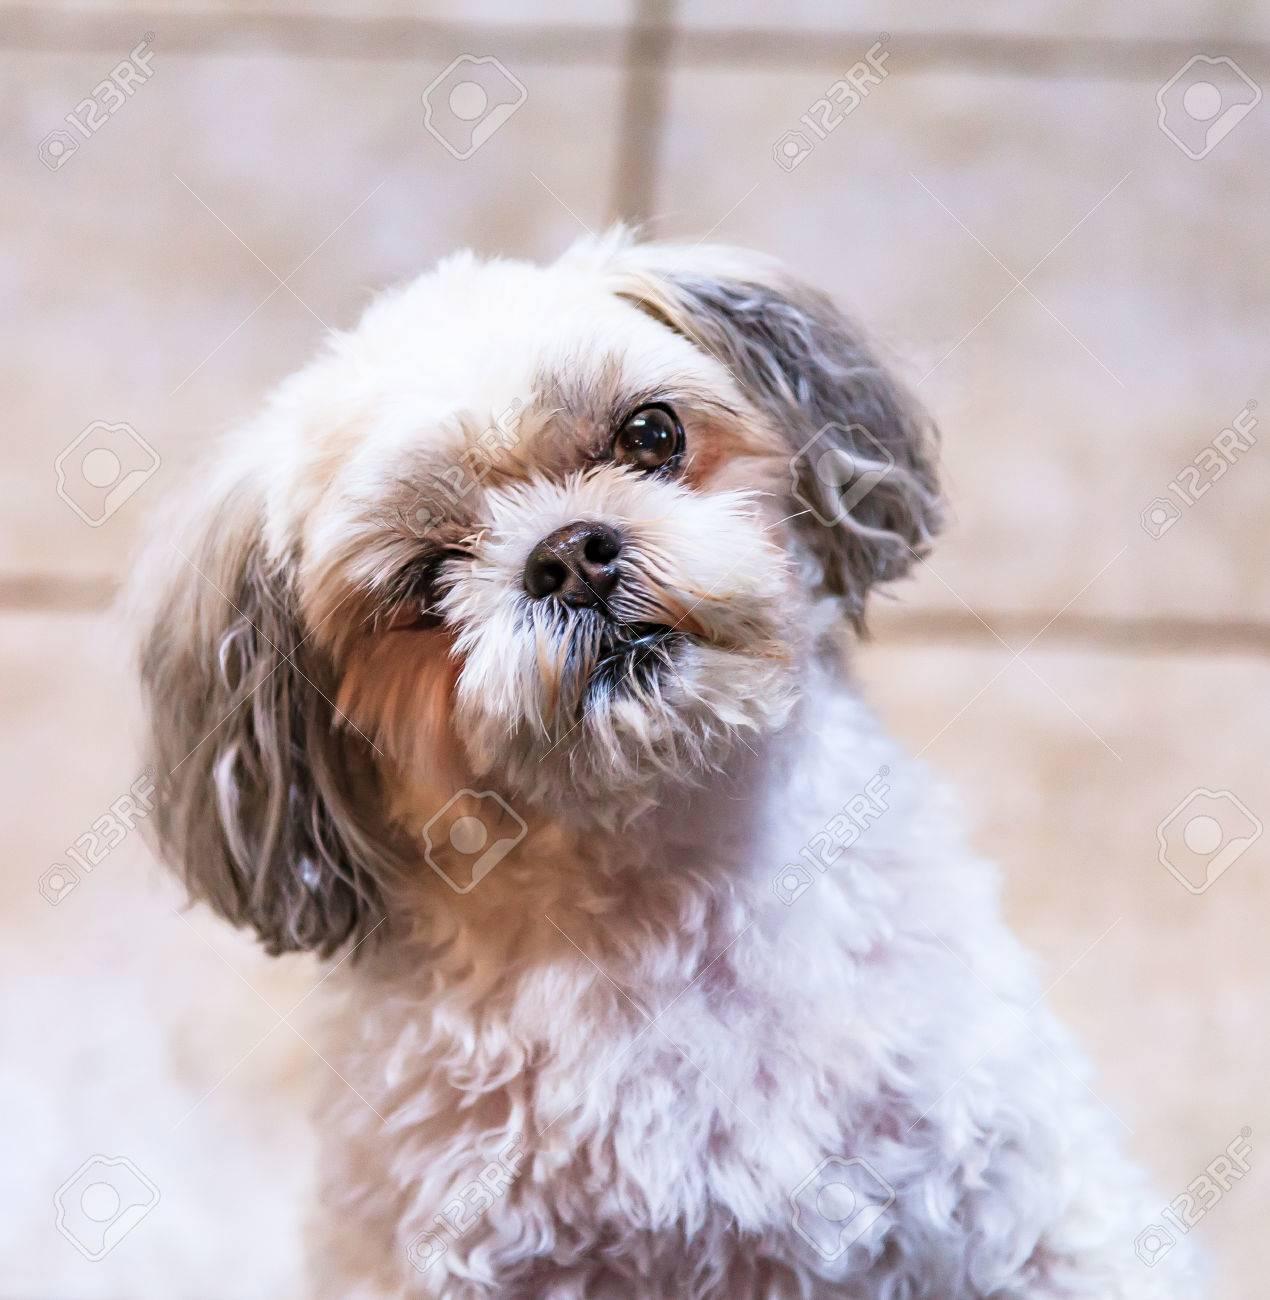 Close up of an inquisitive Shitzu dog. Stock Photo - 58948304